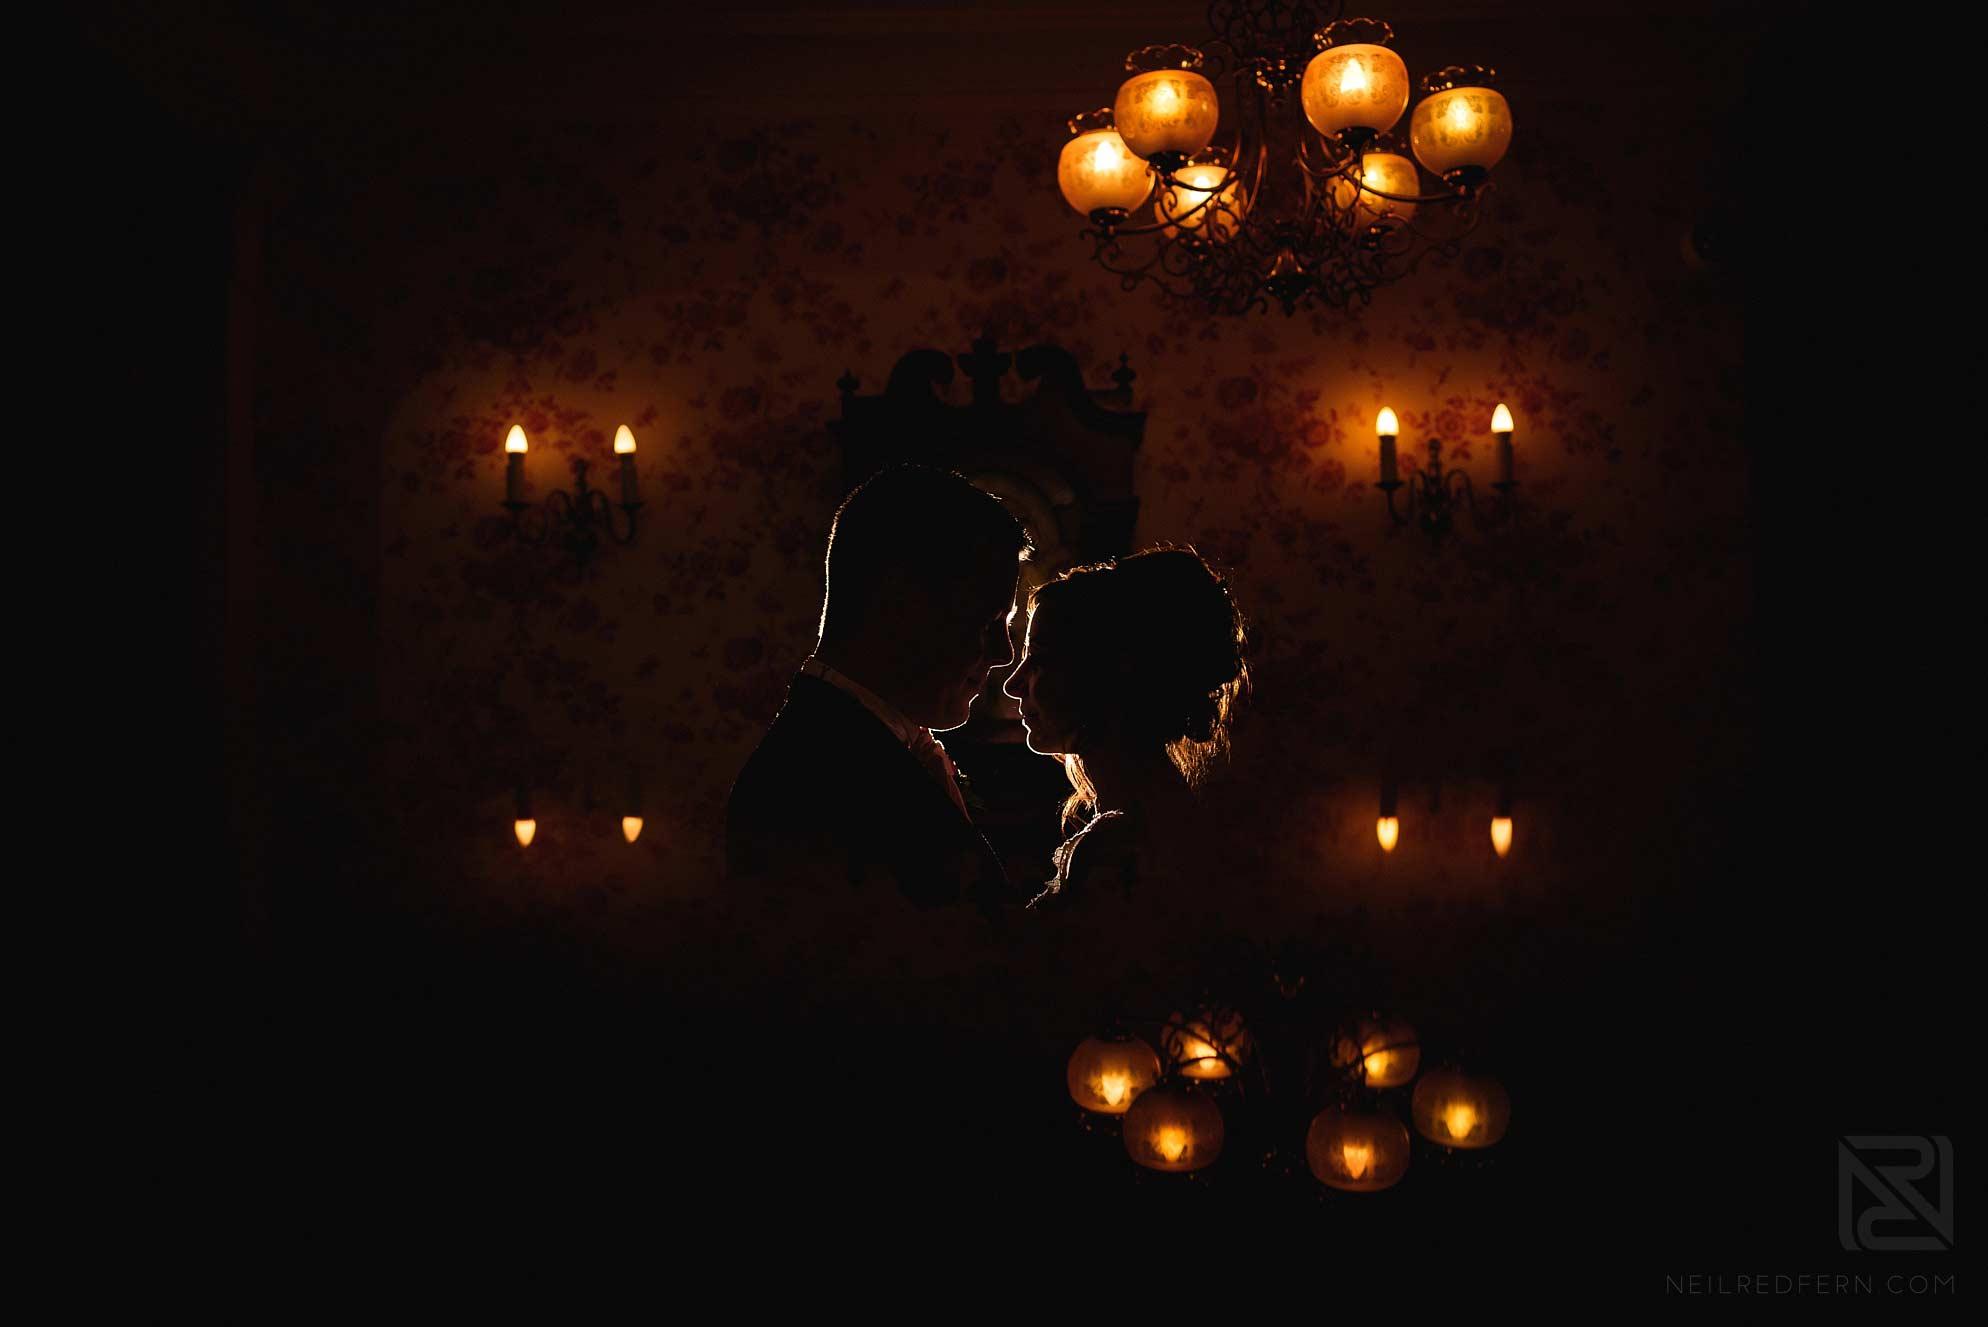 Metropole-Hotel-Llandrindod-Wells-wedding-30